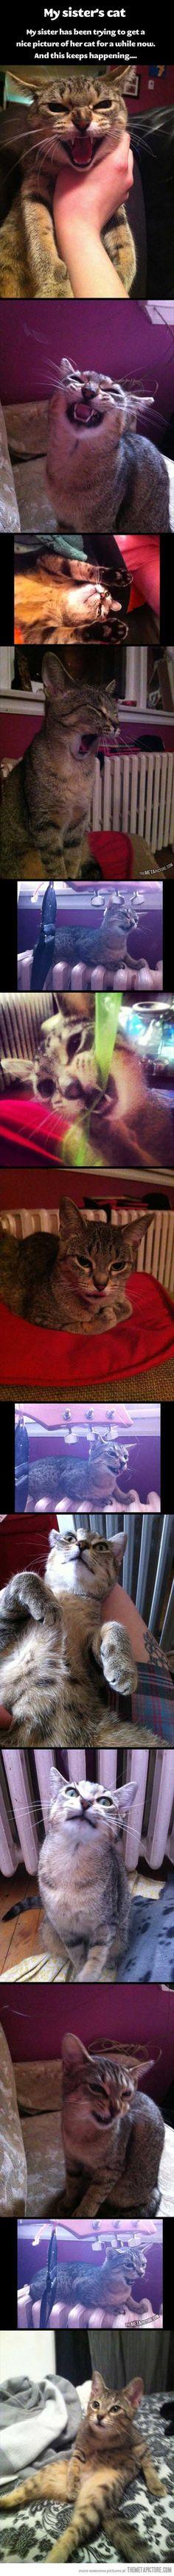 Not so photogenic cat…